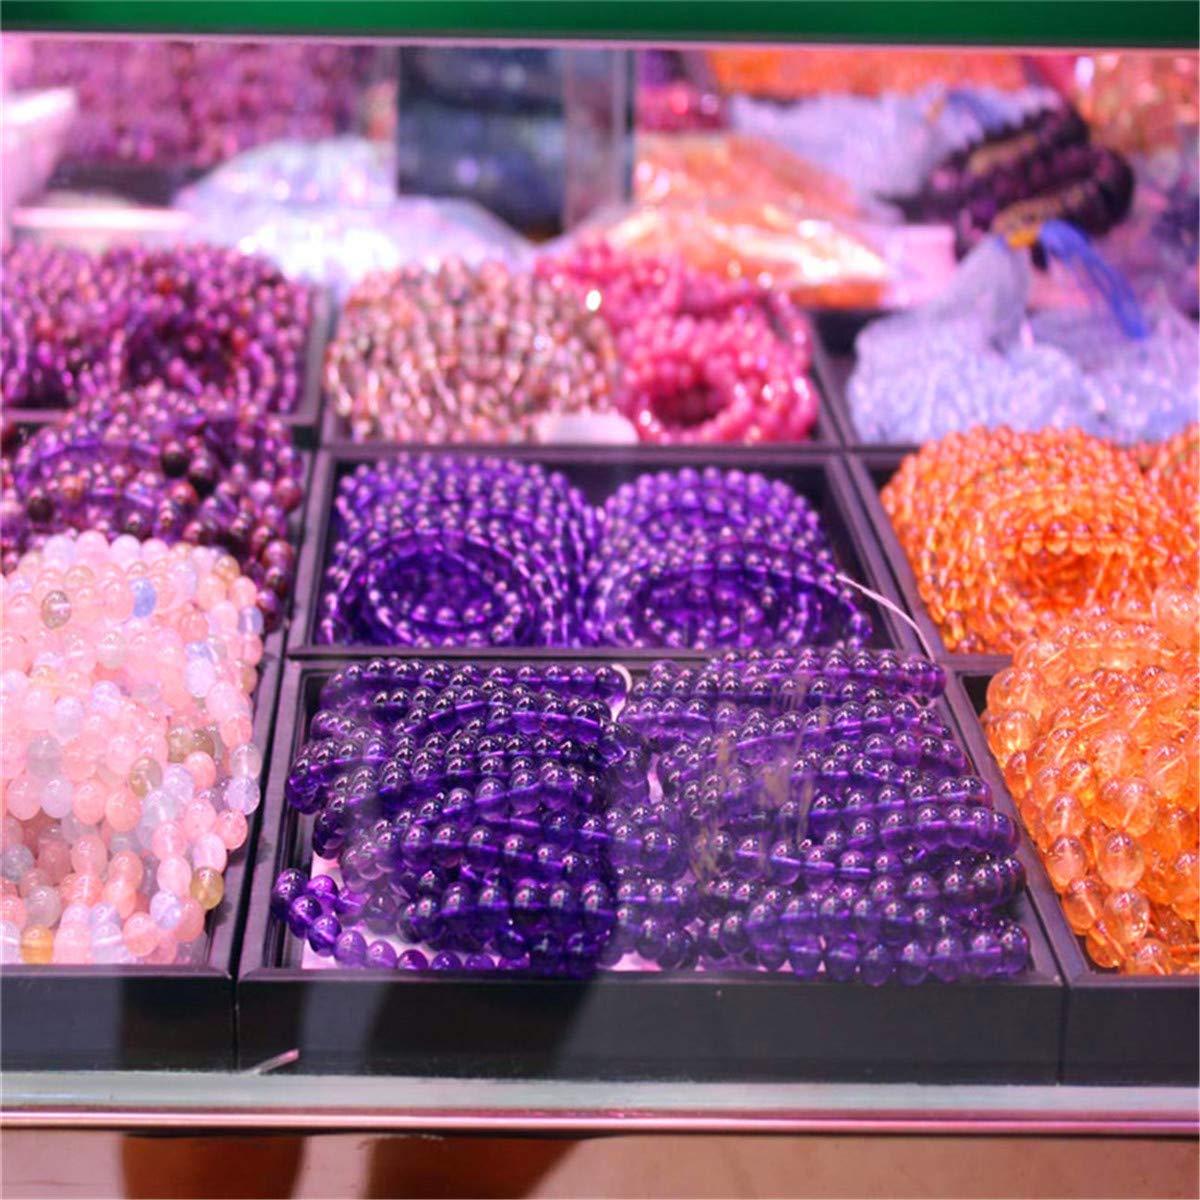 All ingrosso perle di giada 12mm,32pcs 6/mm 8/mm 10/mm 12/mm giada e perle.Perle di giada all ingrosso.All ingrosso perline